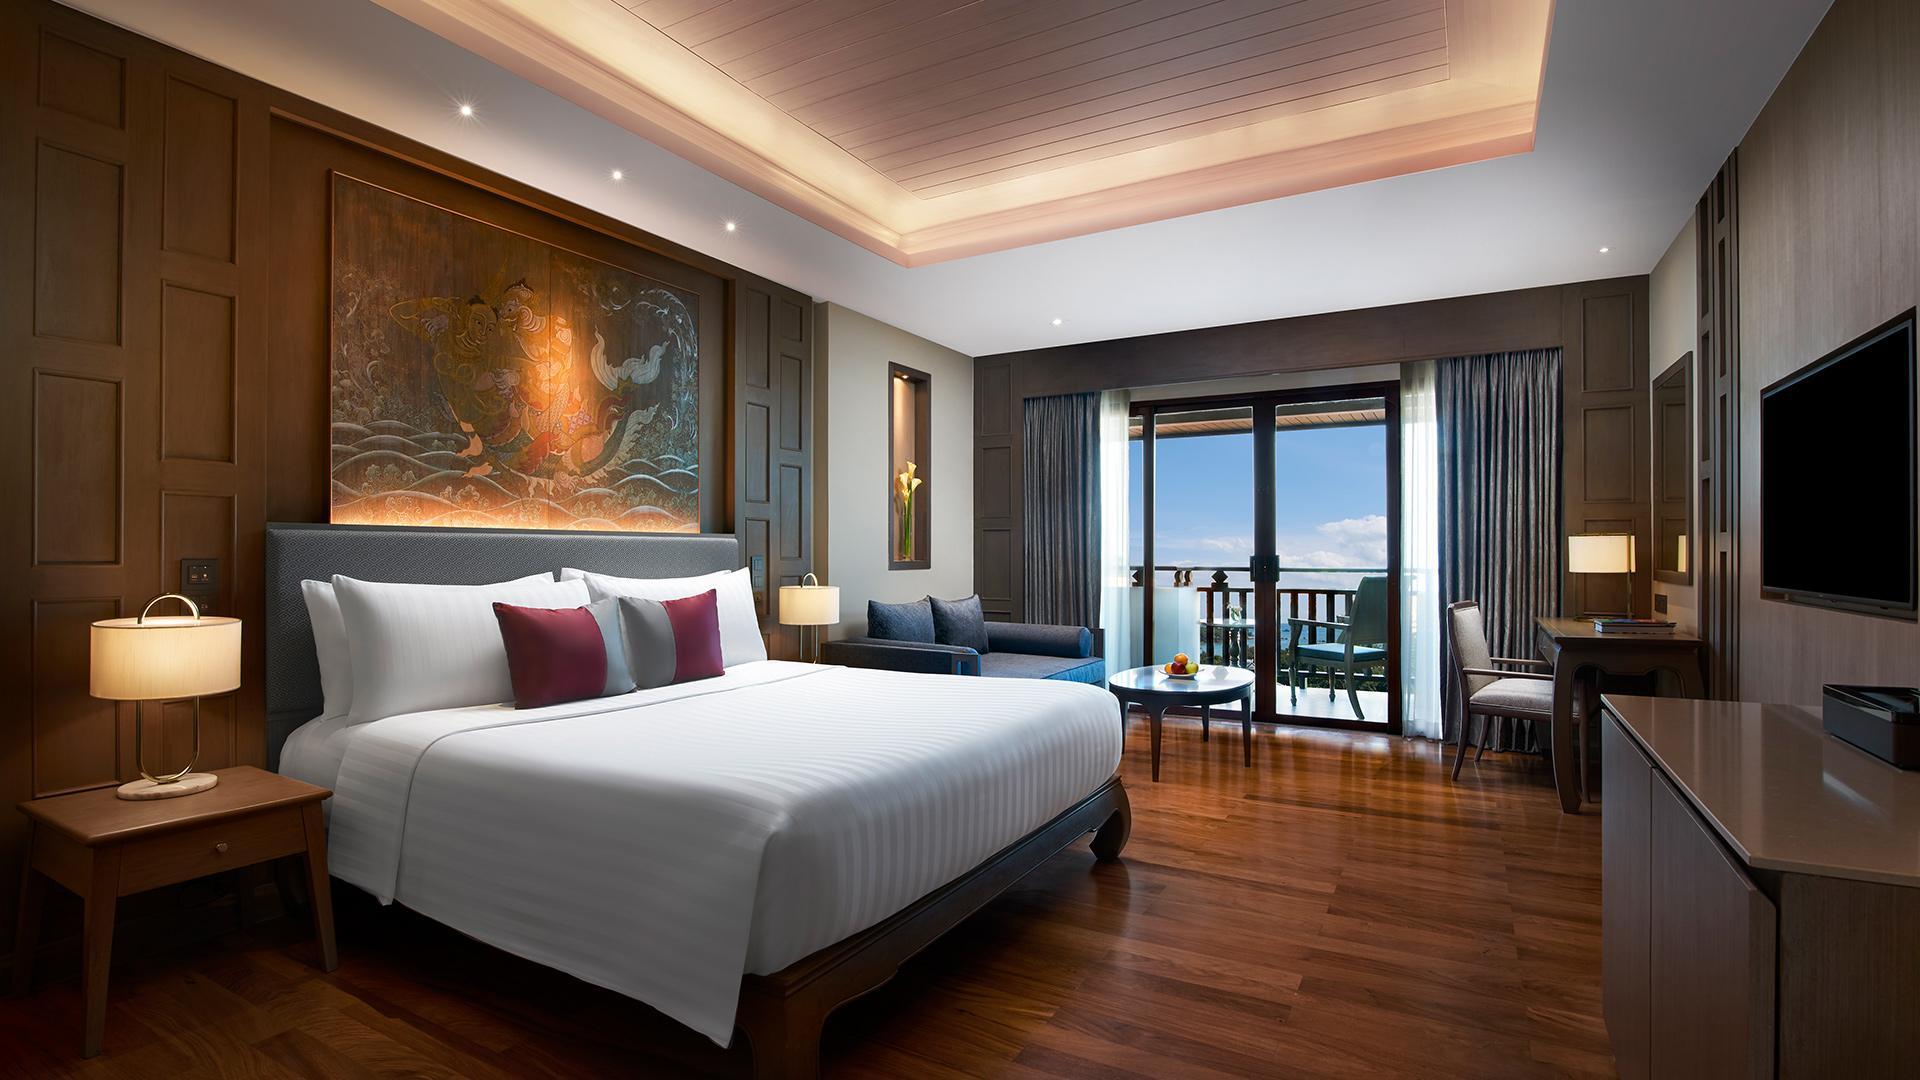 Deluxe Room image 1 at Amari Vogue Krabi by Amphoe Mueang Krabi, Chang Wat Krabi, Thailand